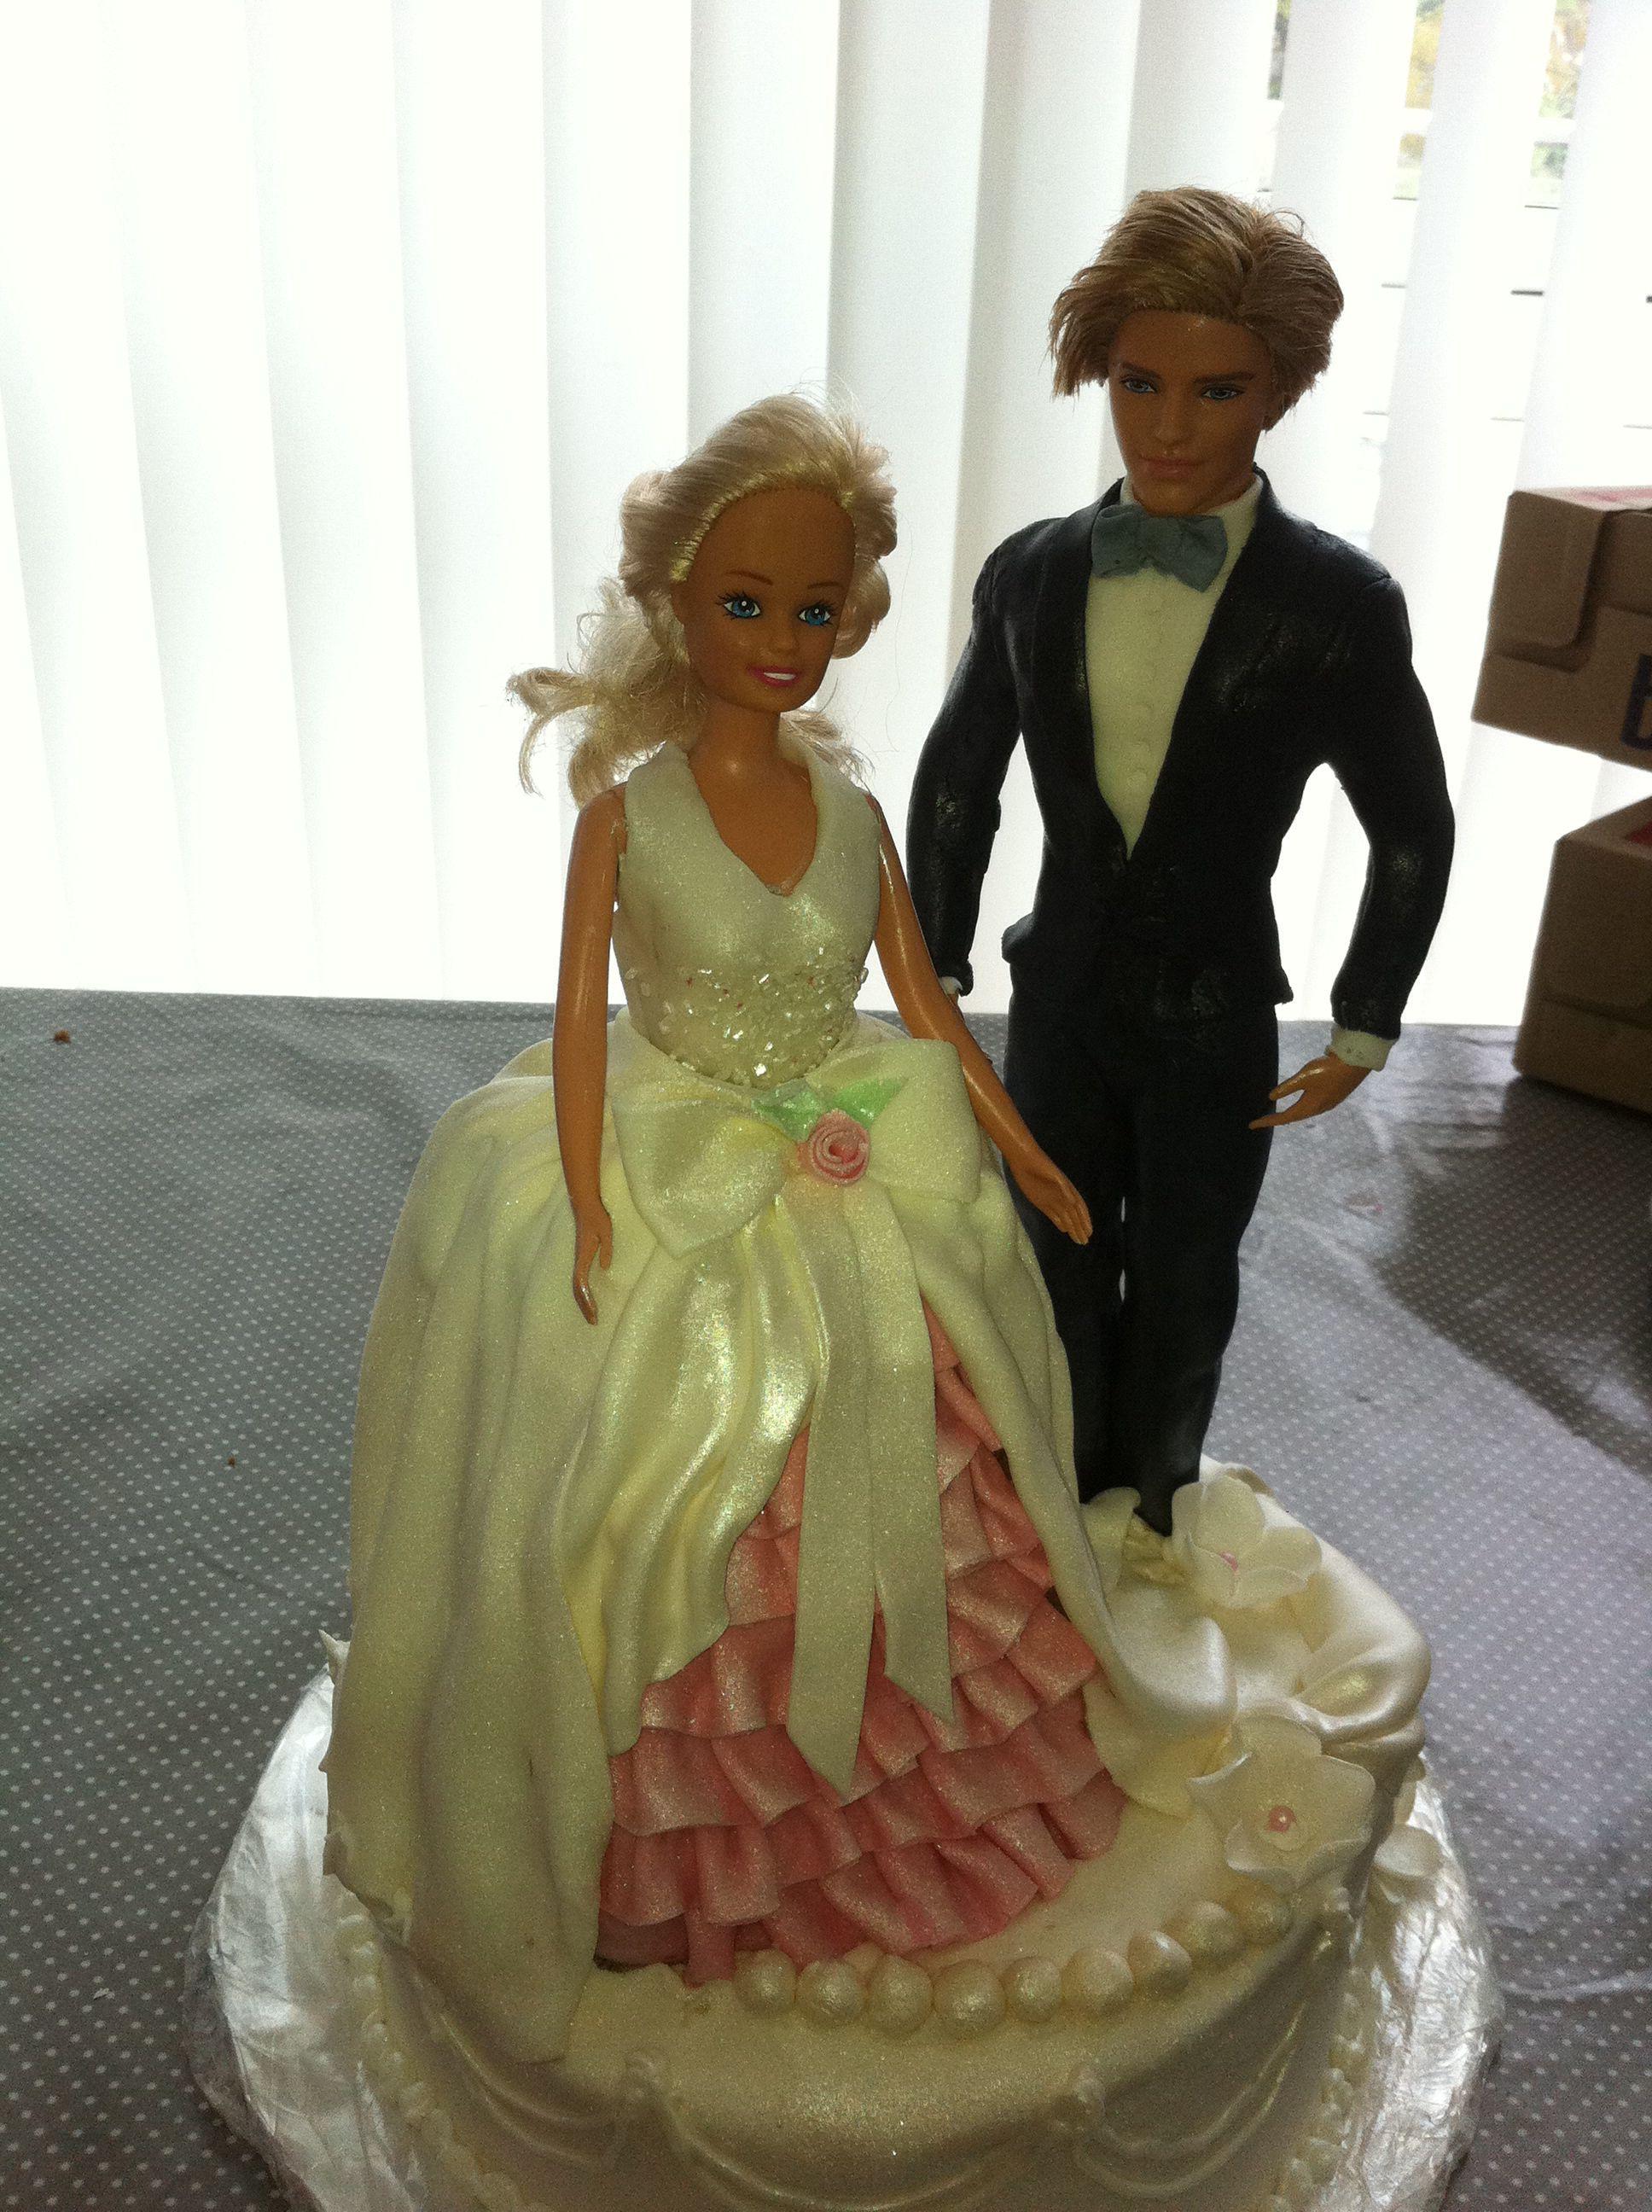 Barbie and Ken wedding cake